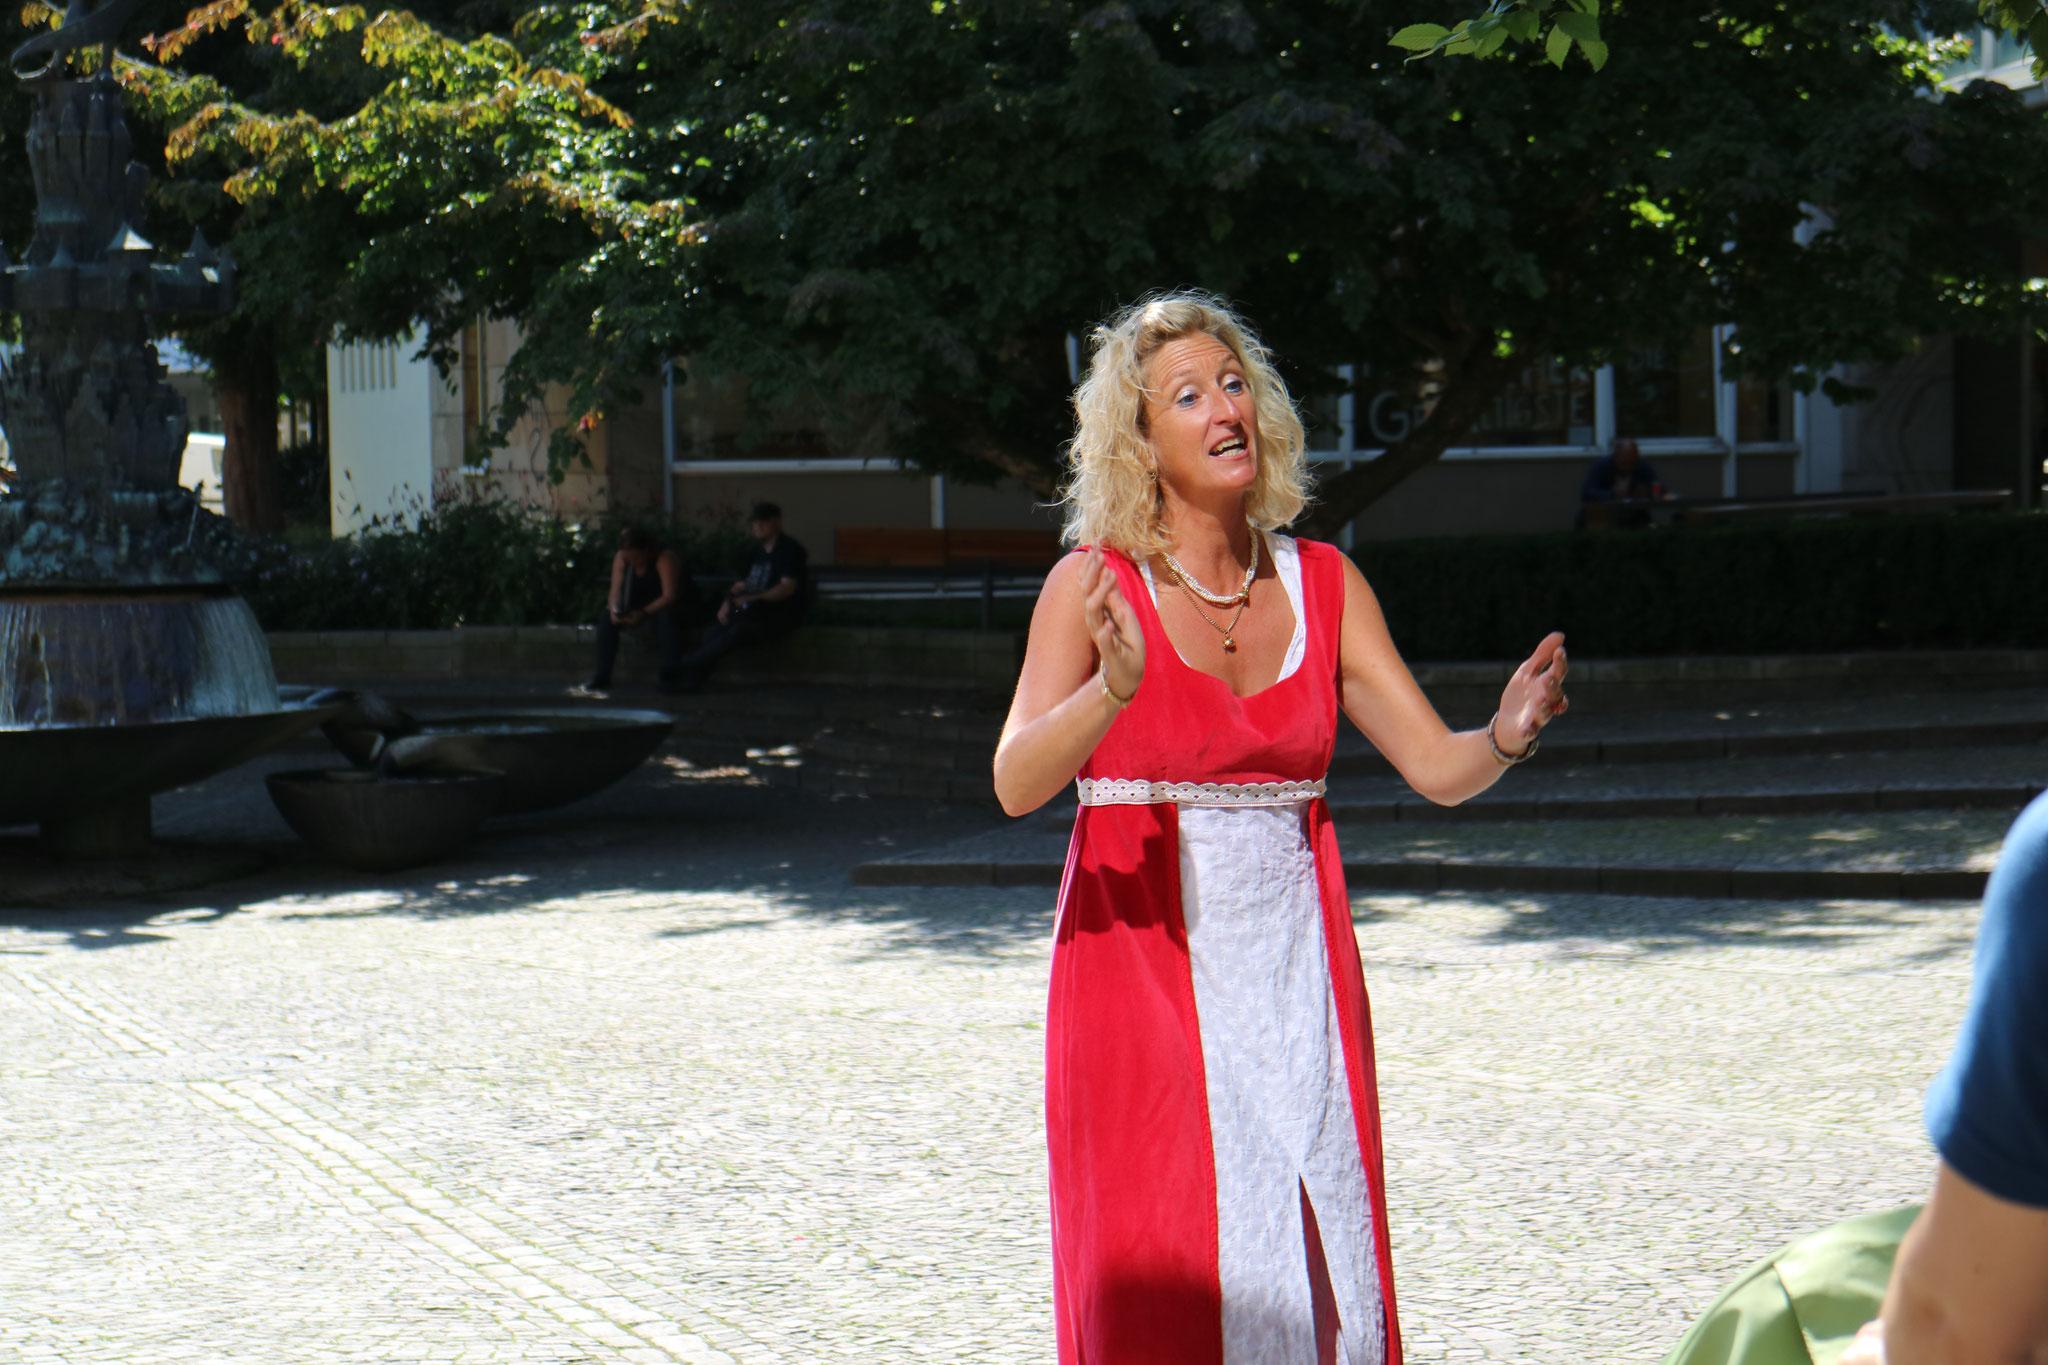 Osnabrücker Märchensamstag 2021 - Sonja Fischer Fotos: Erzähltheater Osnabrück / Sabine Meyer